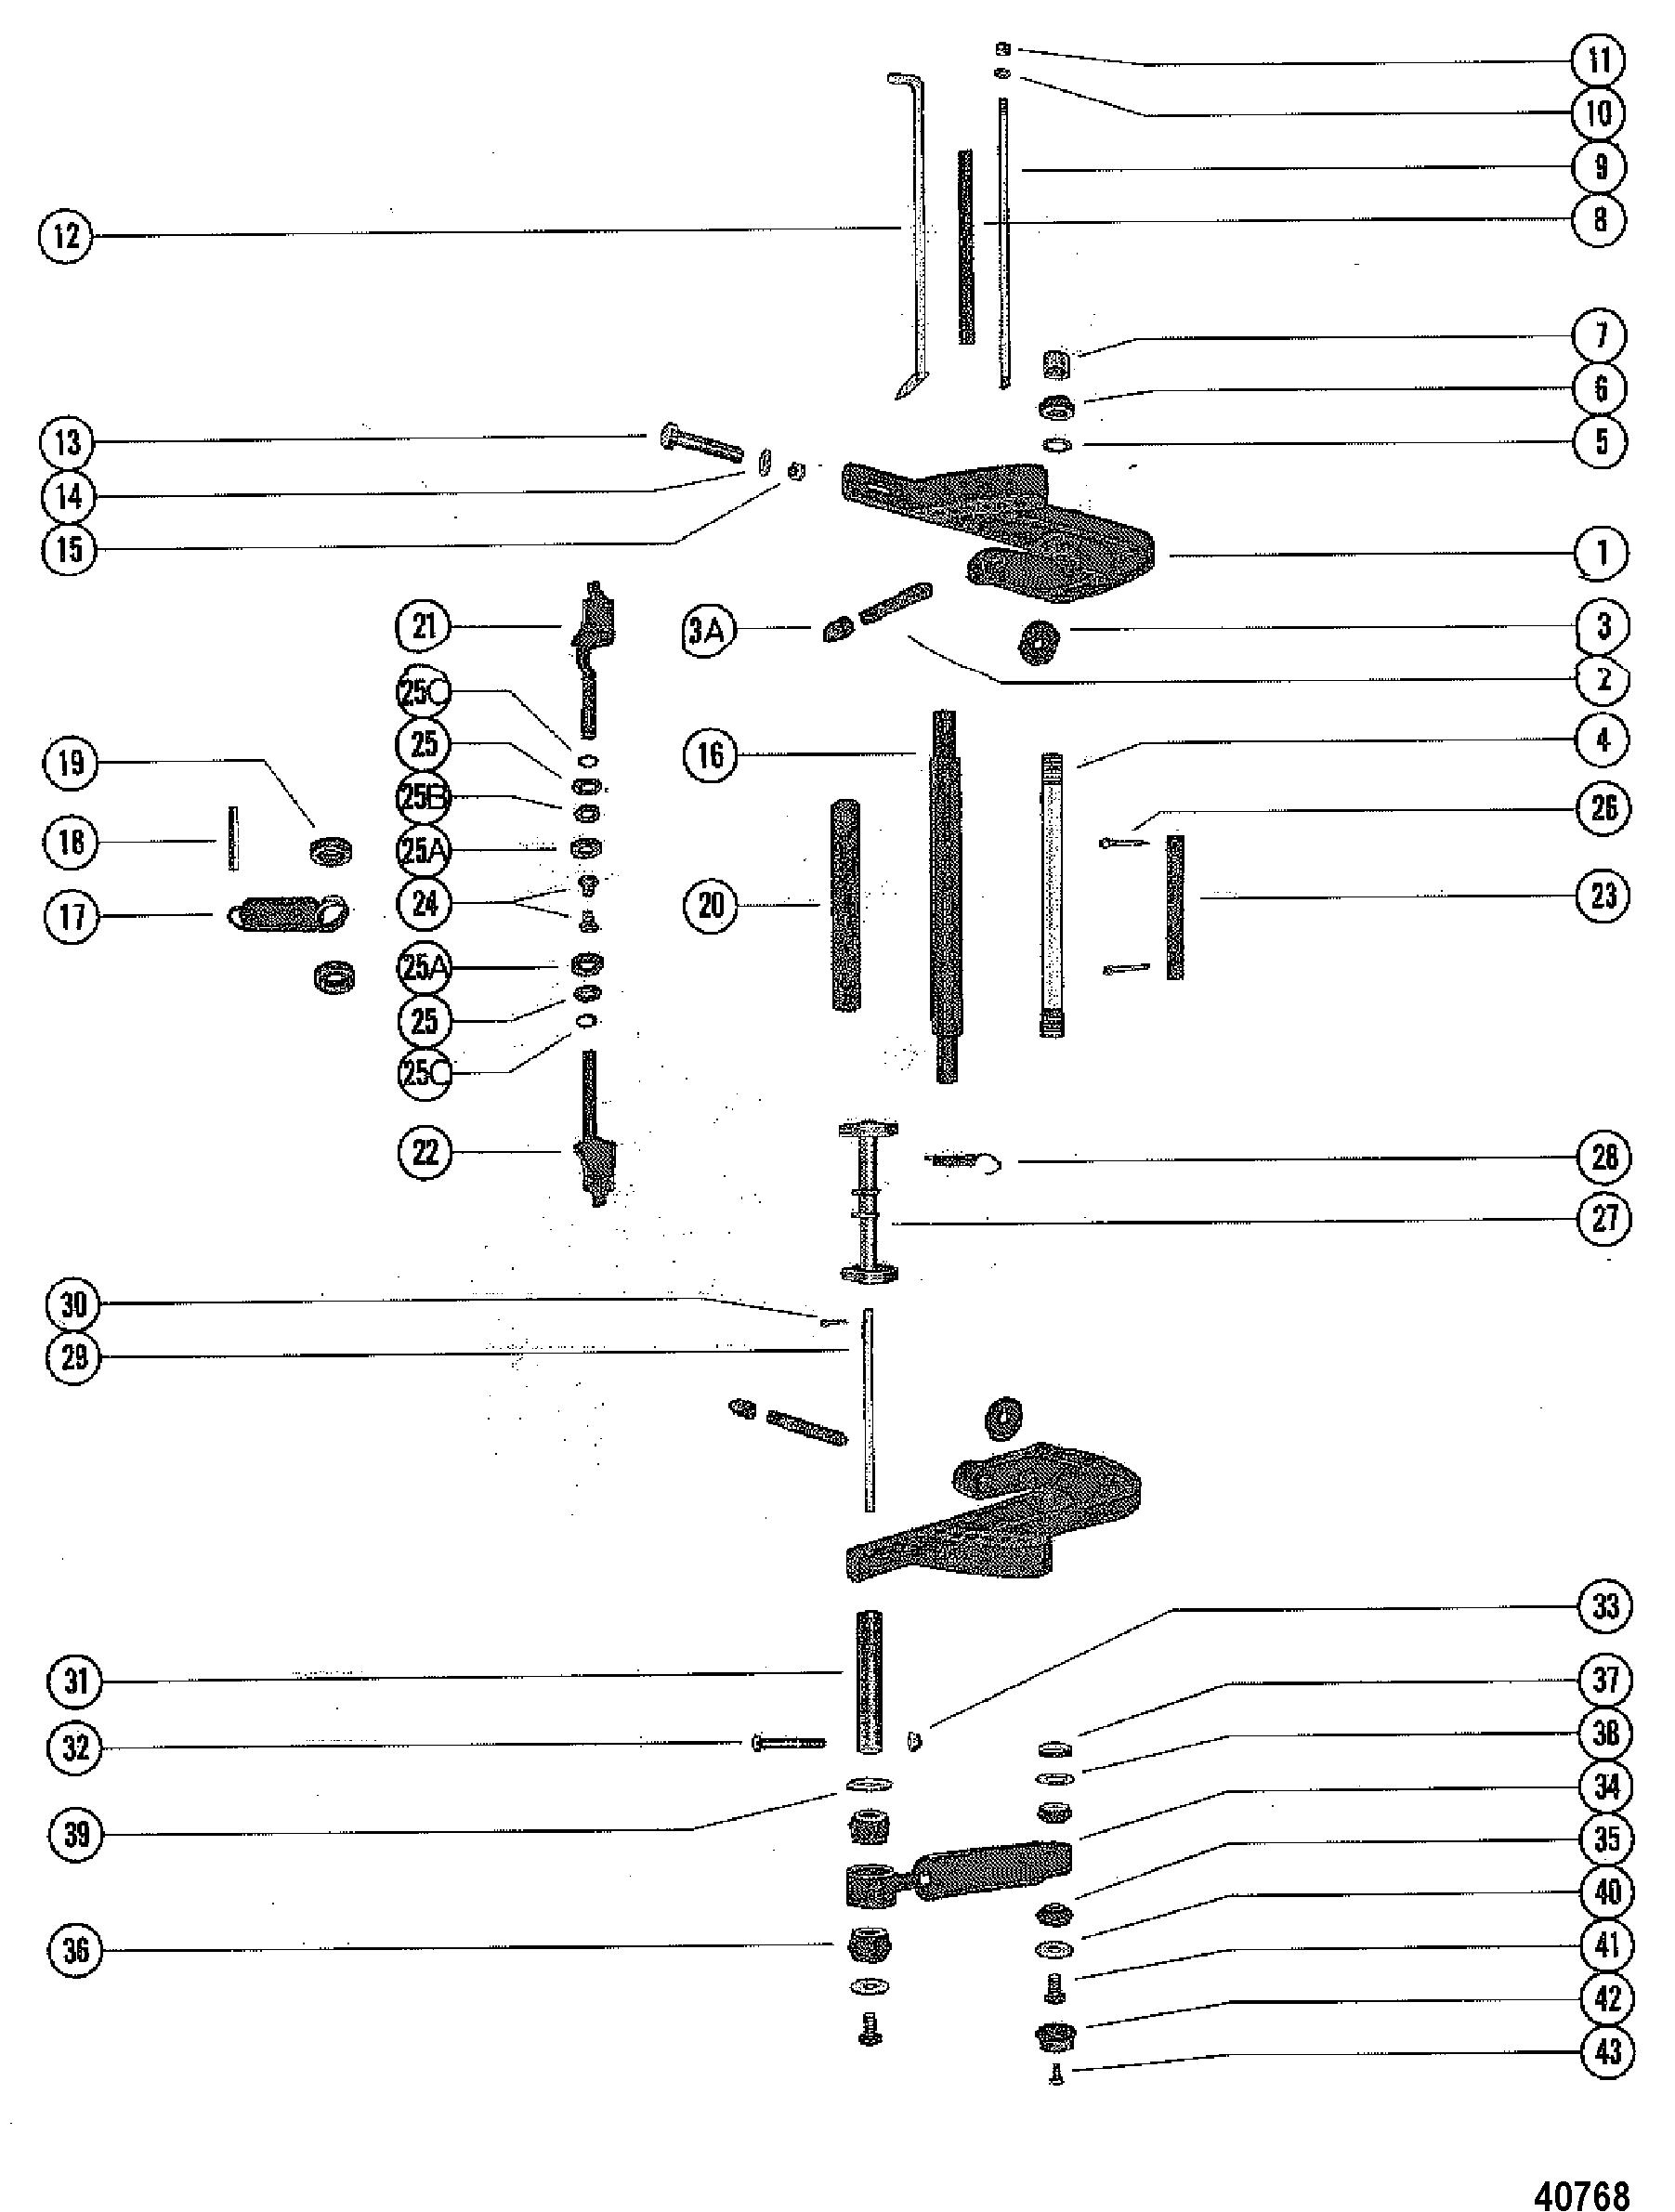 CLAMP BRACKET AND REVERSE LOCK FOR MERCURY MERC 1150